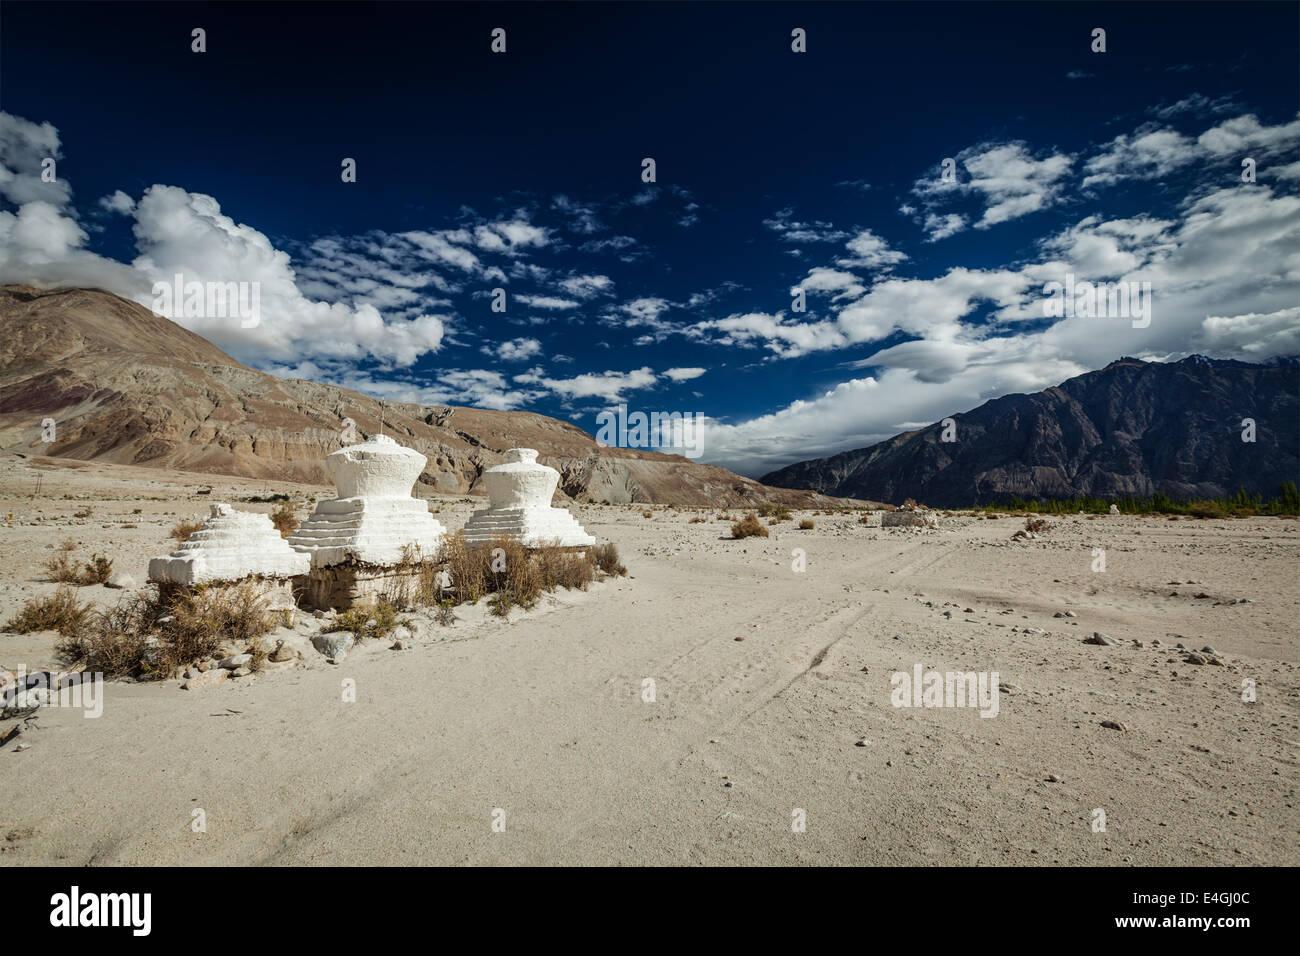 Chortens (Tibetan Buddhism stupa) in Himalayas. Nubra valley, Ladakh, India - Stock Image